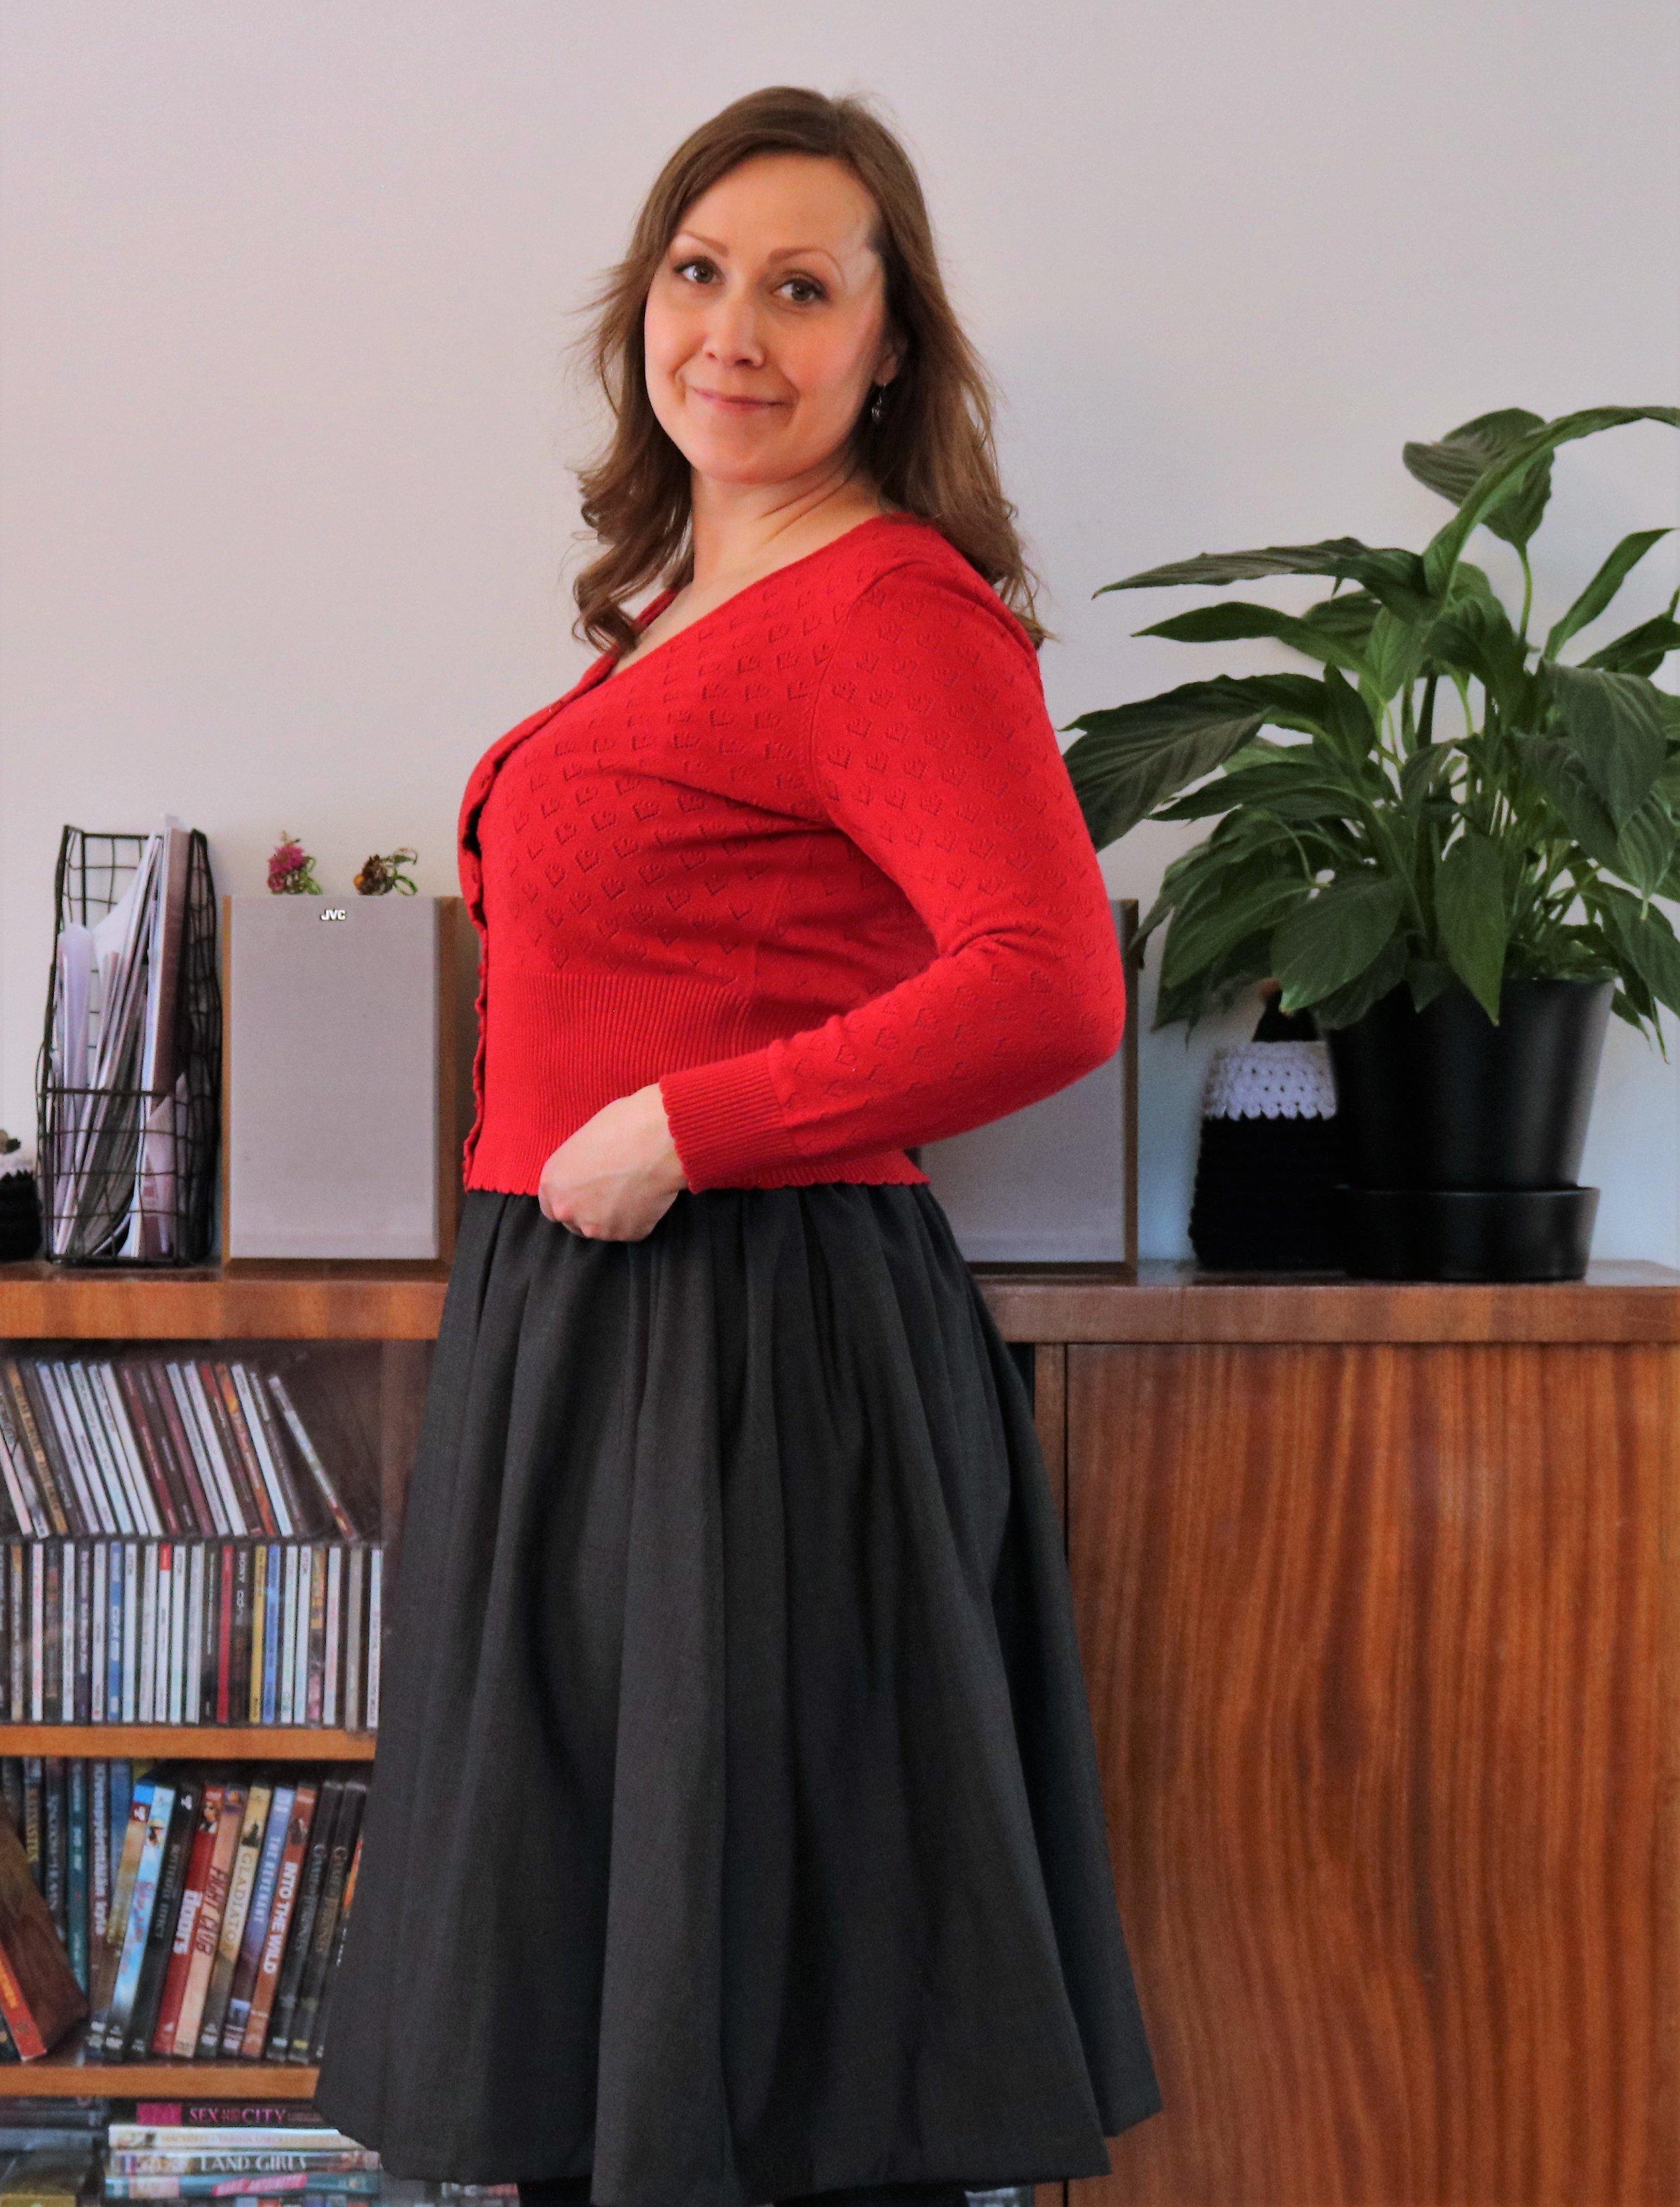 knitlish & sew blog rosie skirt front2.2.jpg